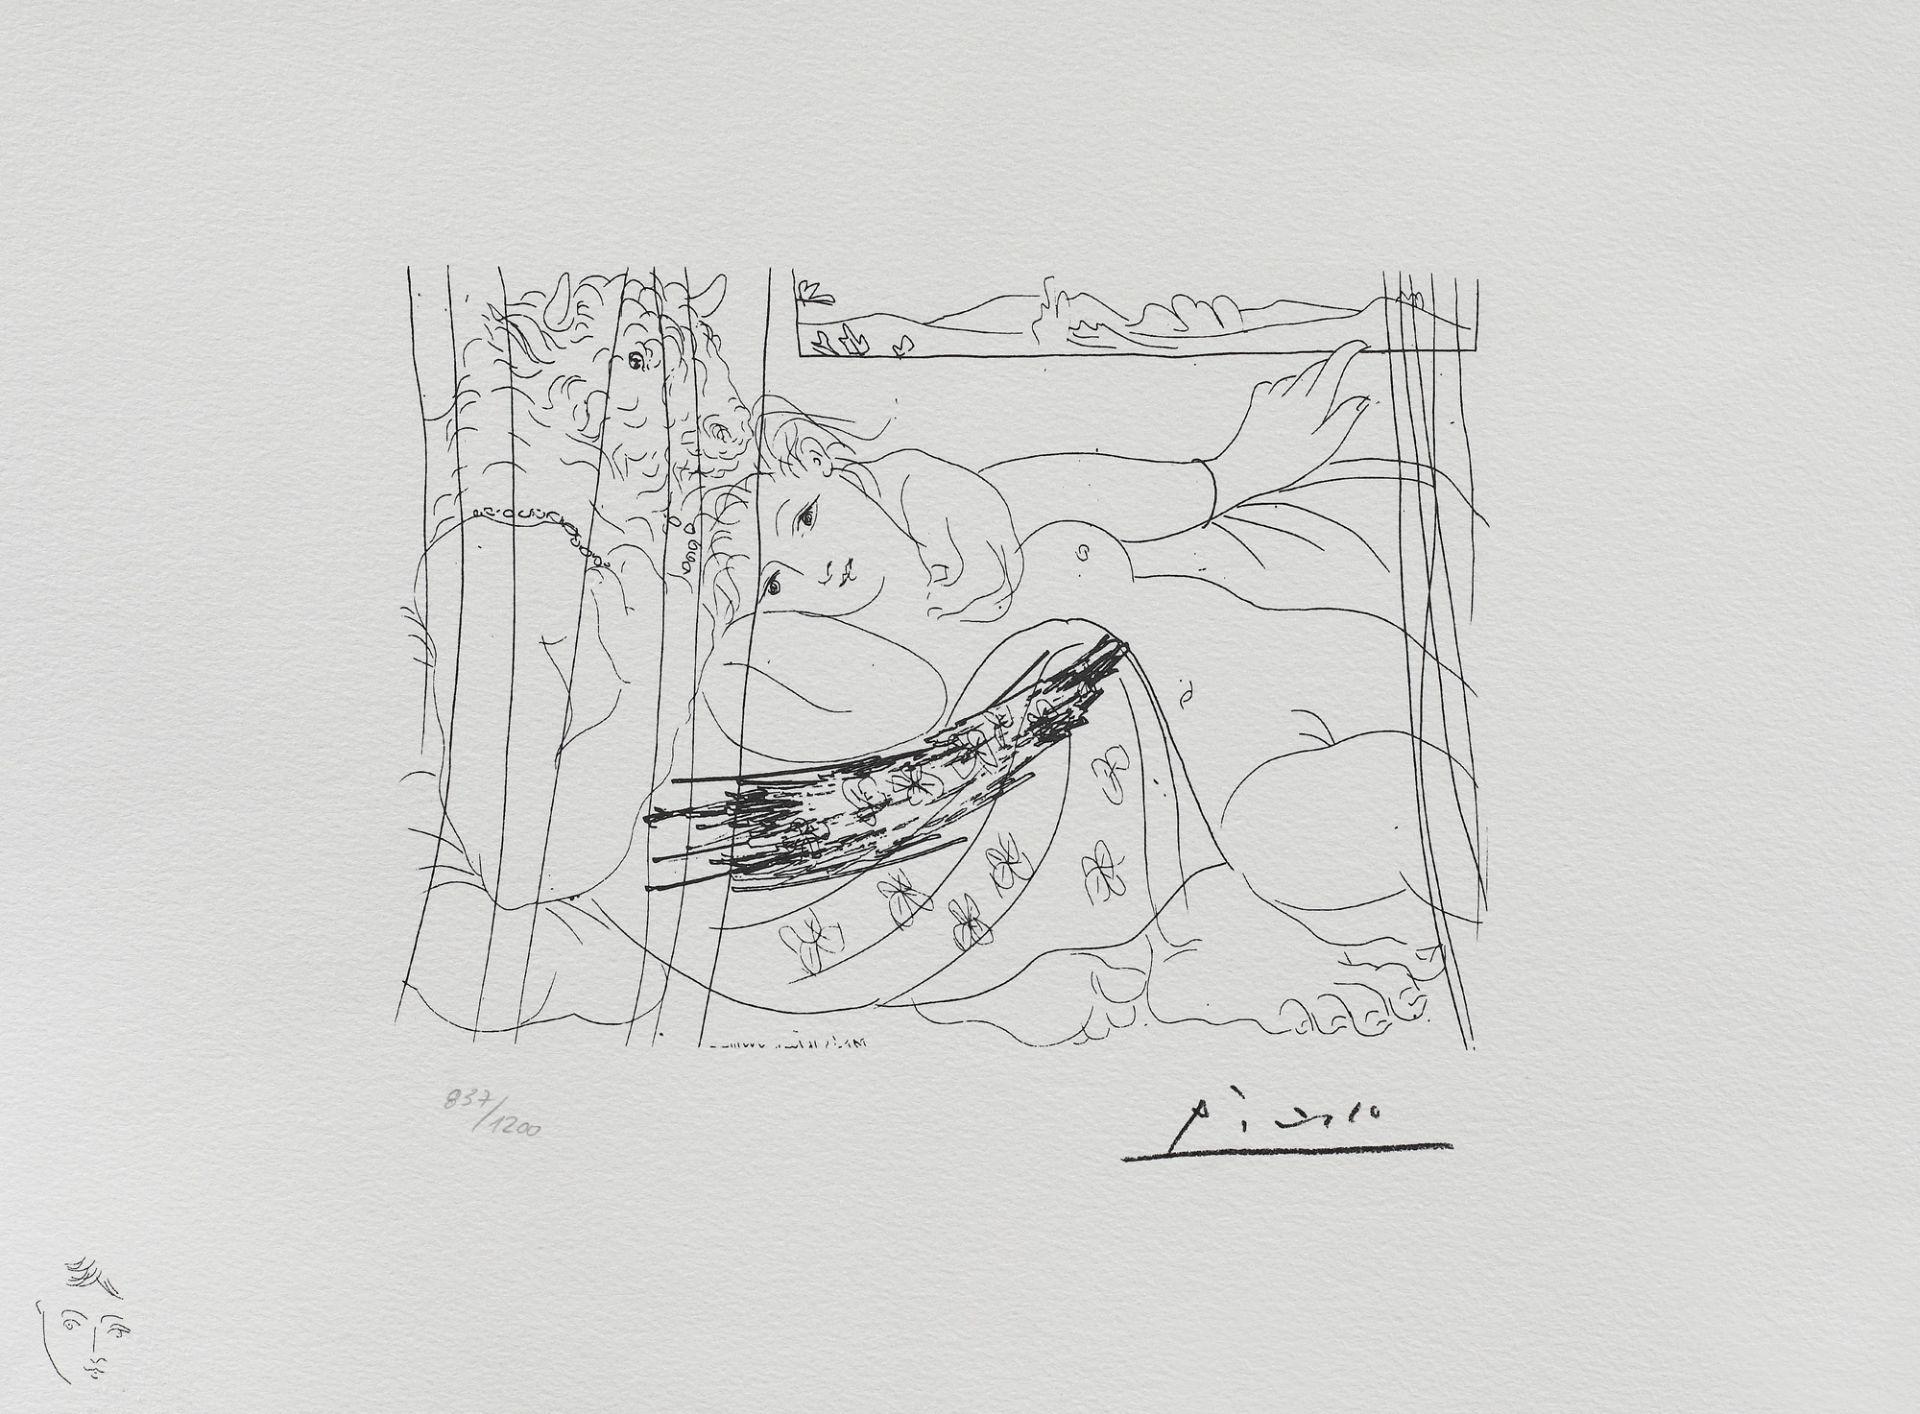 Pablo Picasso, MinotaurPablo Picasso, Minotaur, lithography, 16 × 22 cm, signed, engraved, bot